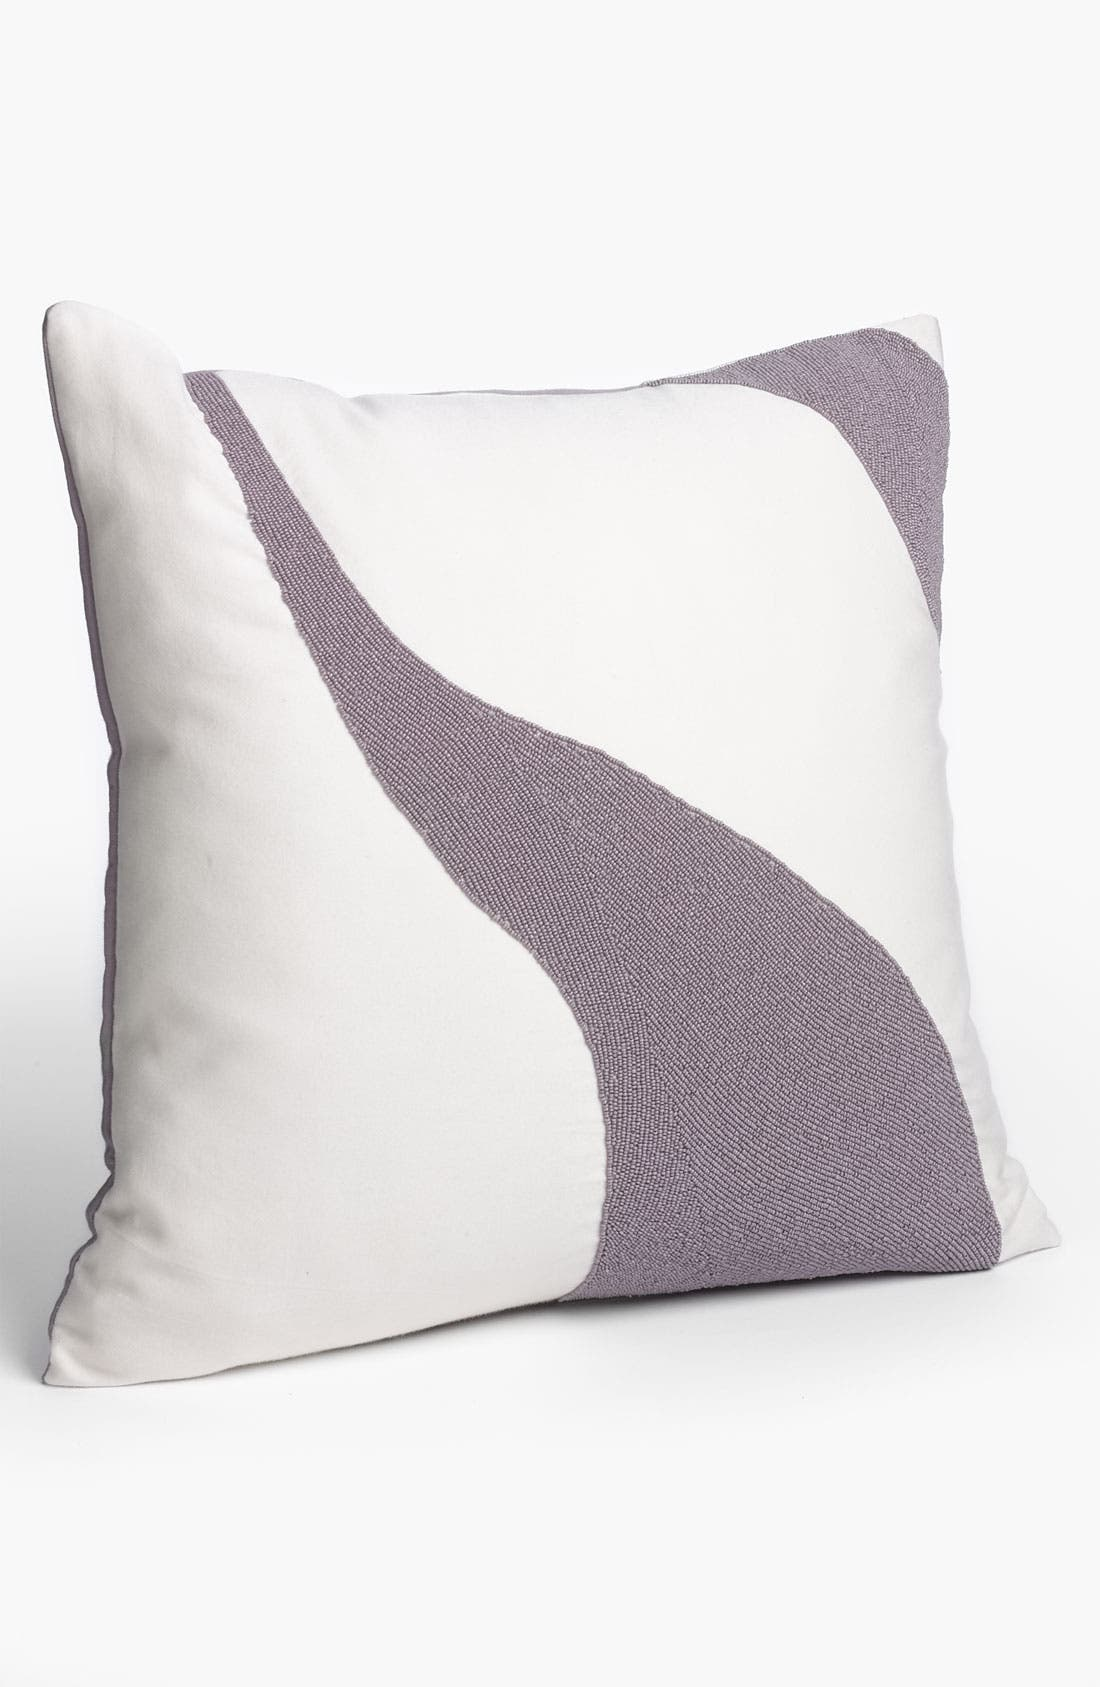 Alternate Image 1 Selected - Diane von Furstenberg 'Beaded Wave' Pillow